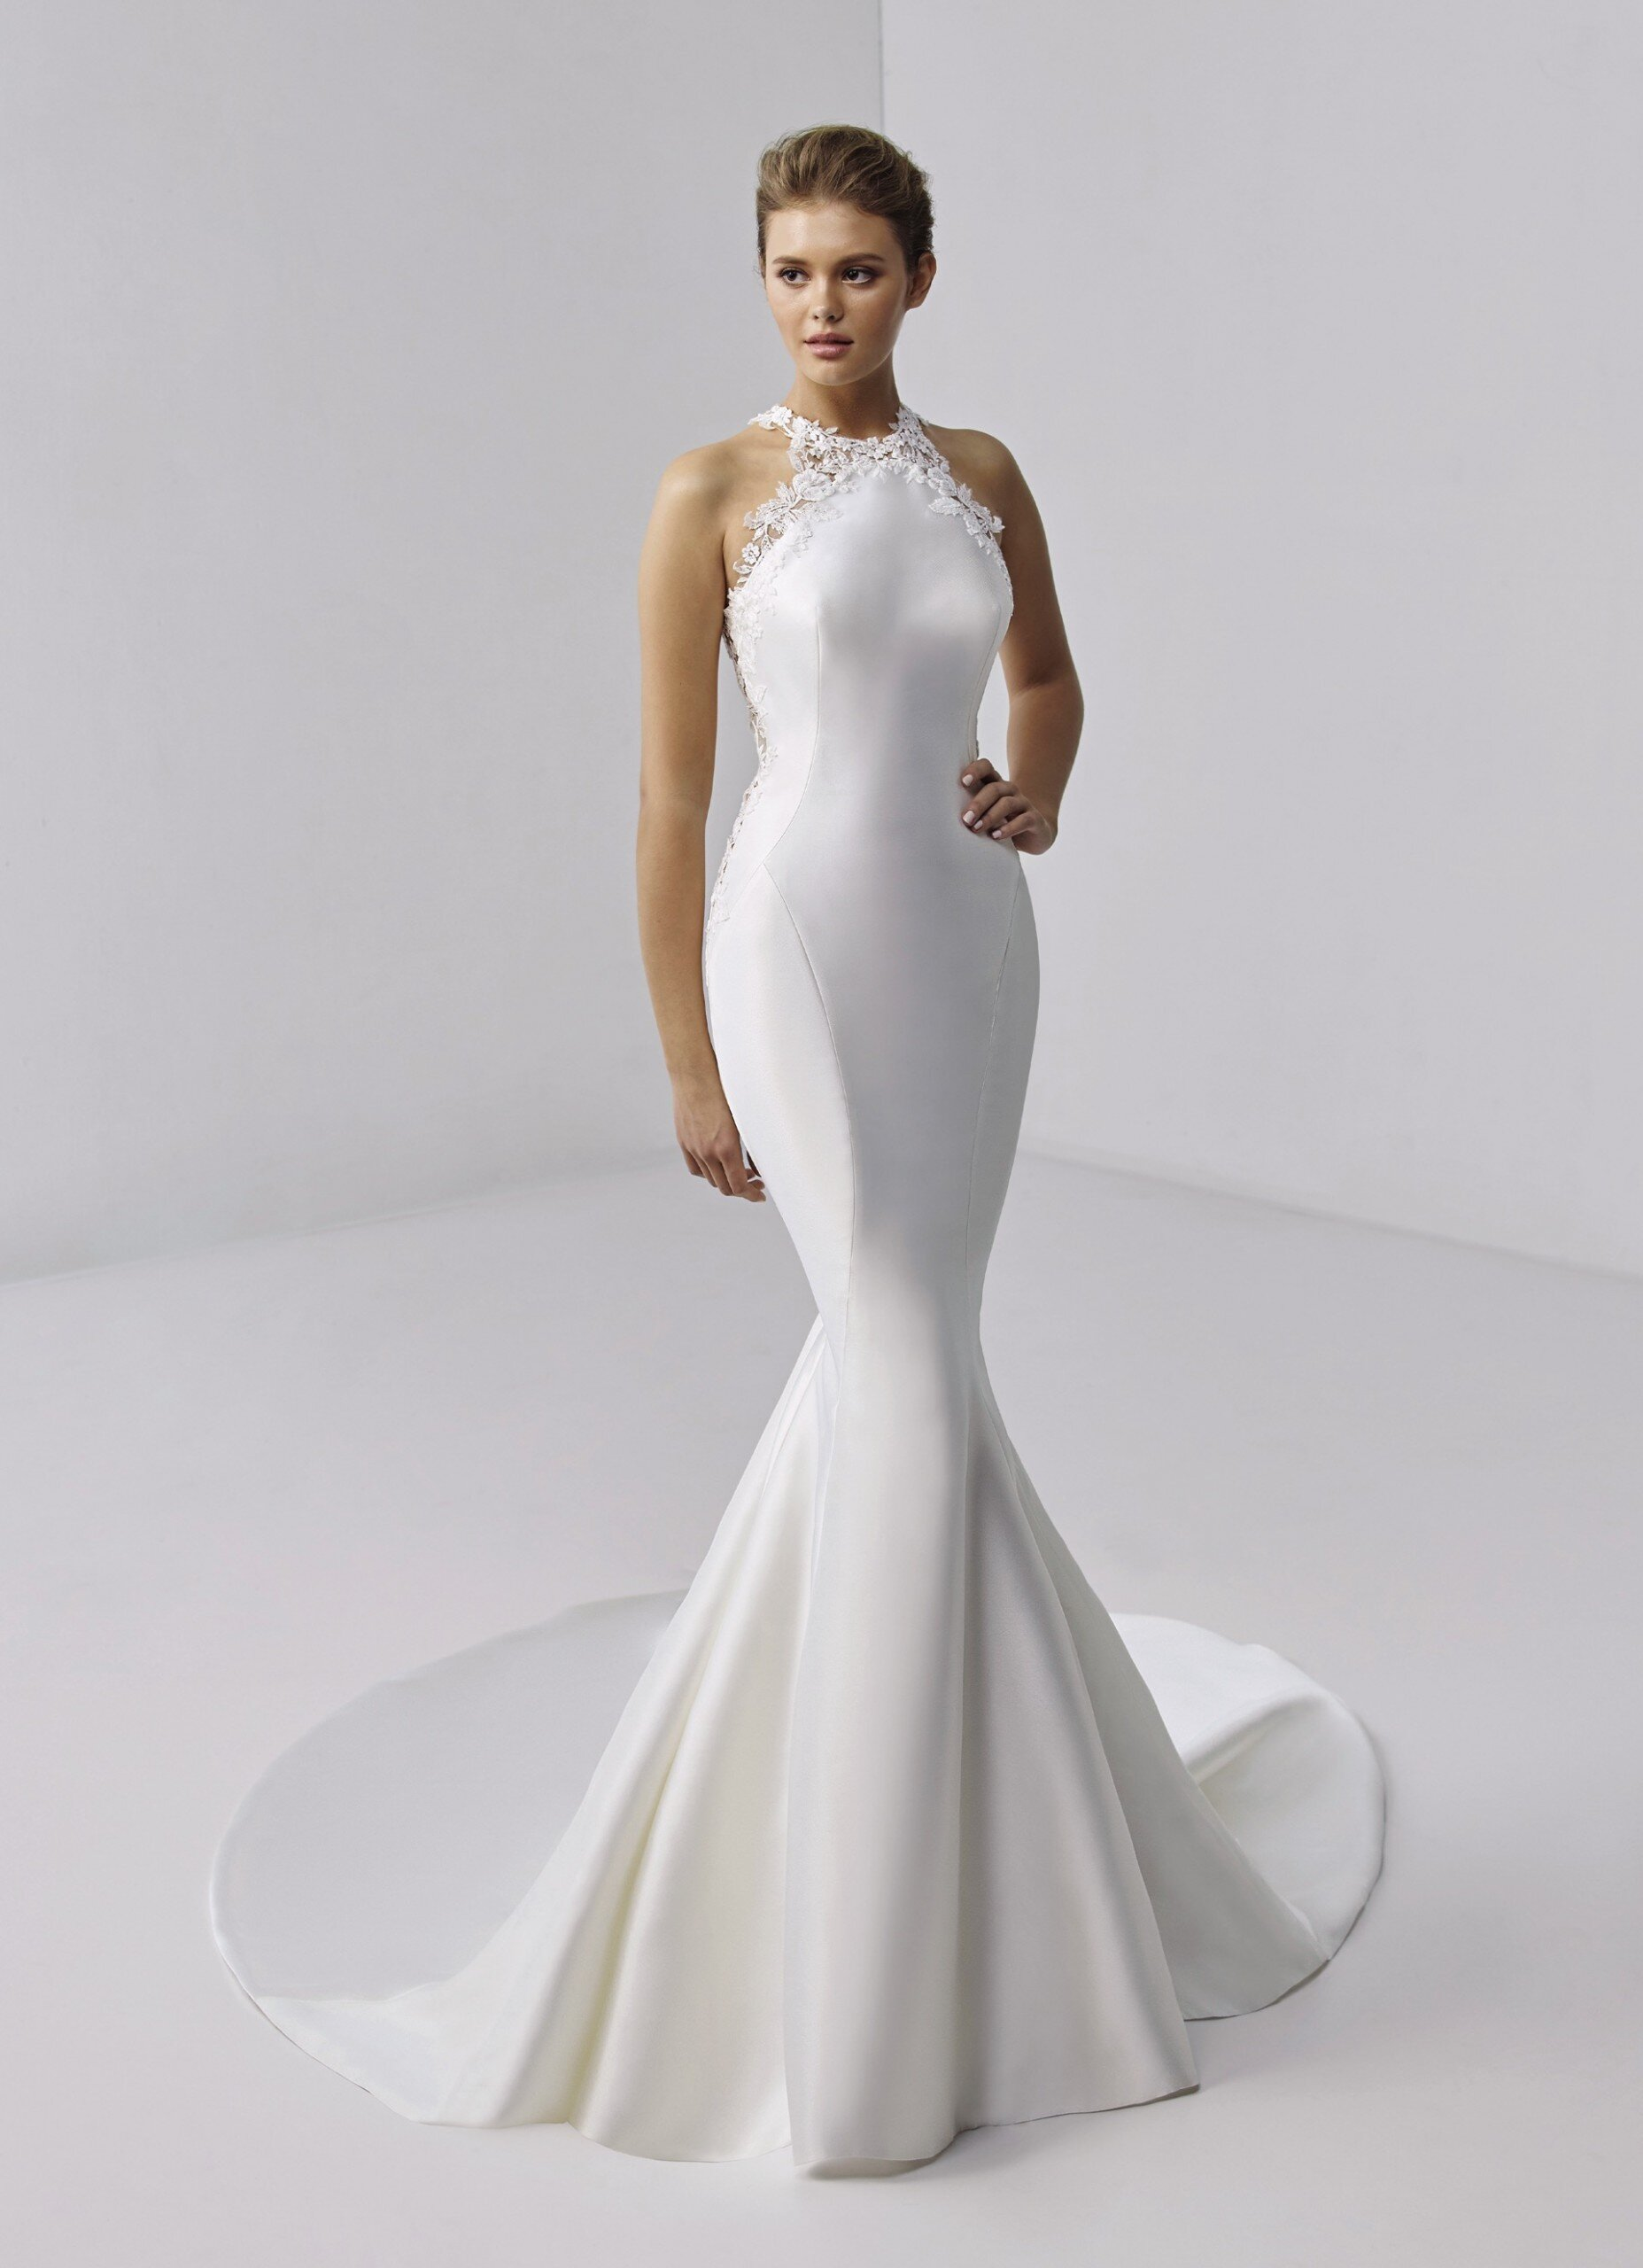 Etoile Brautmode Kollektion 2021 Modell Camille